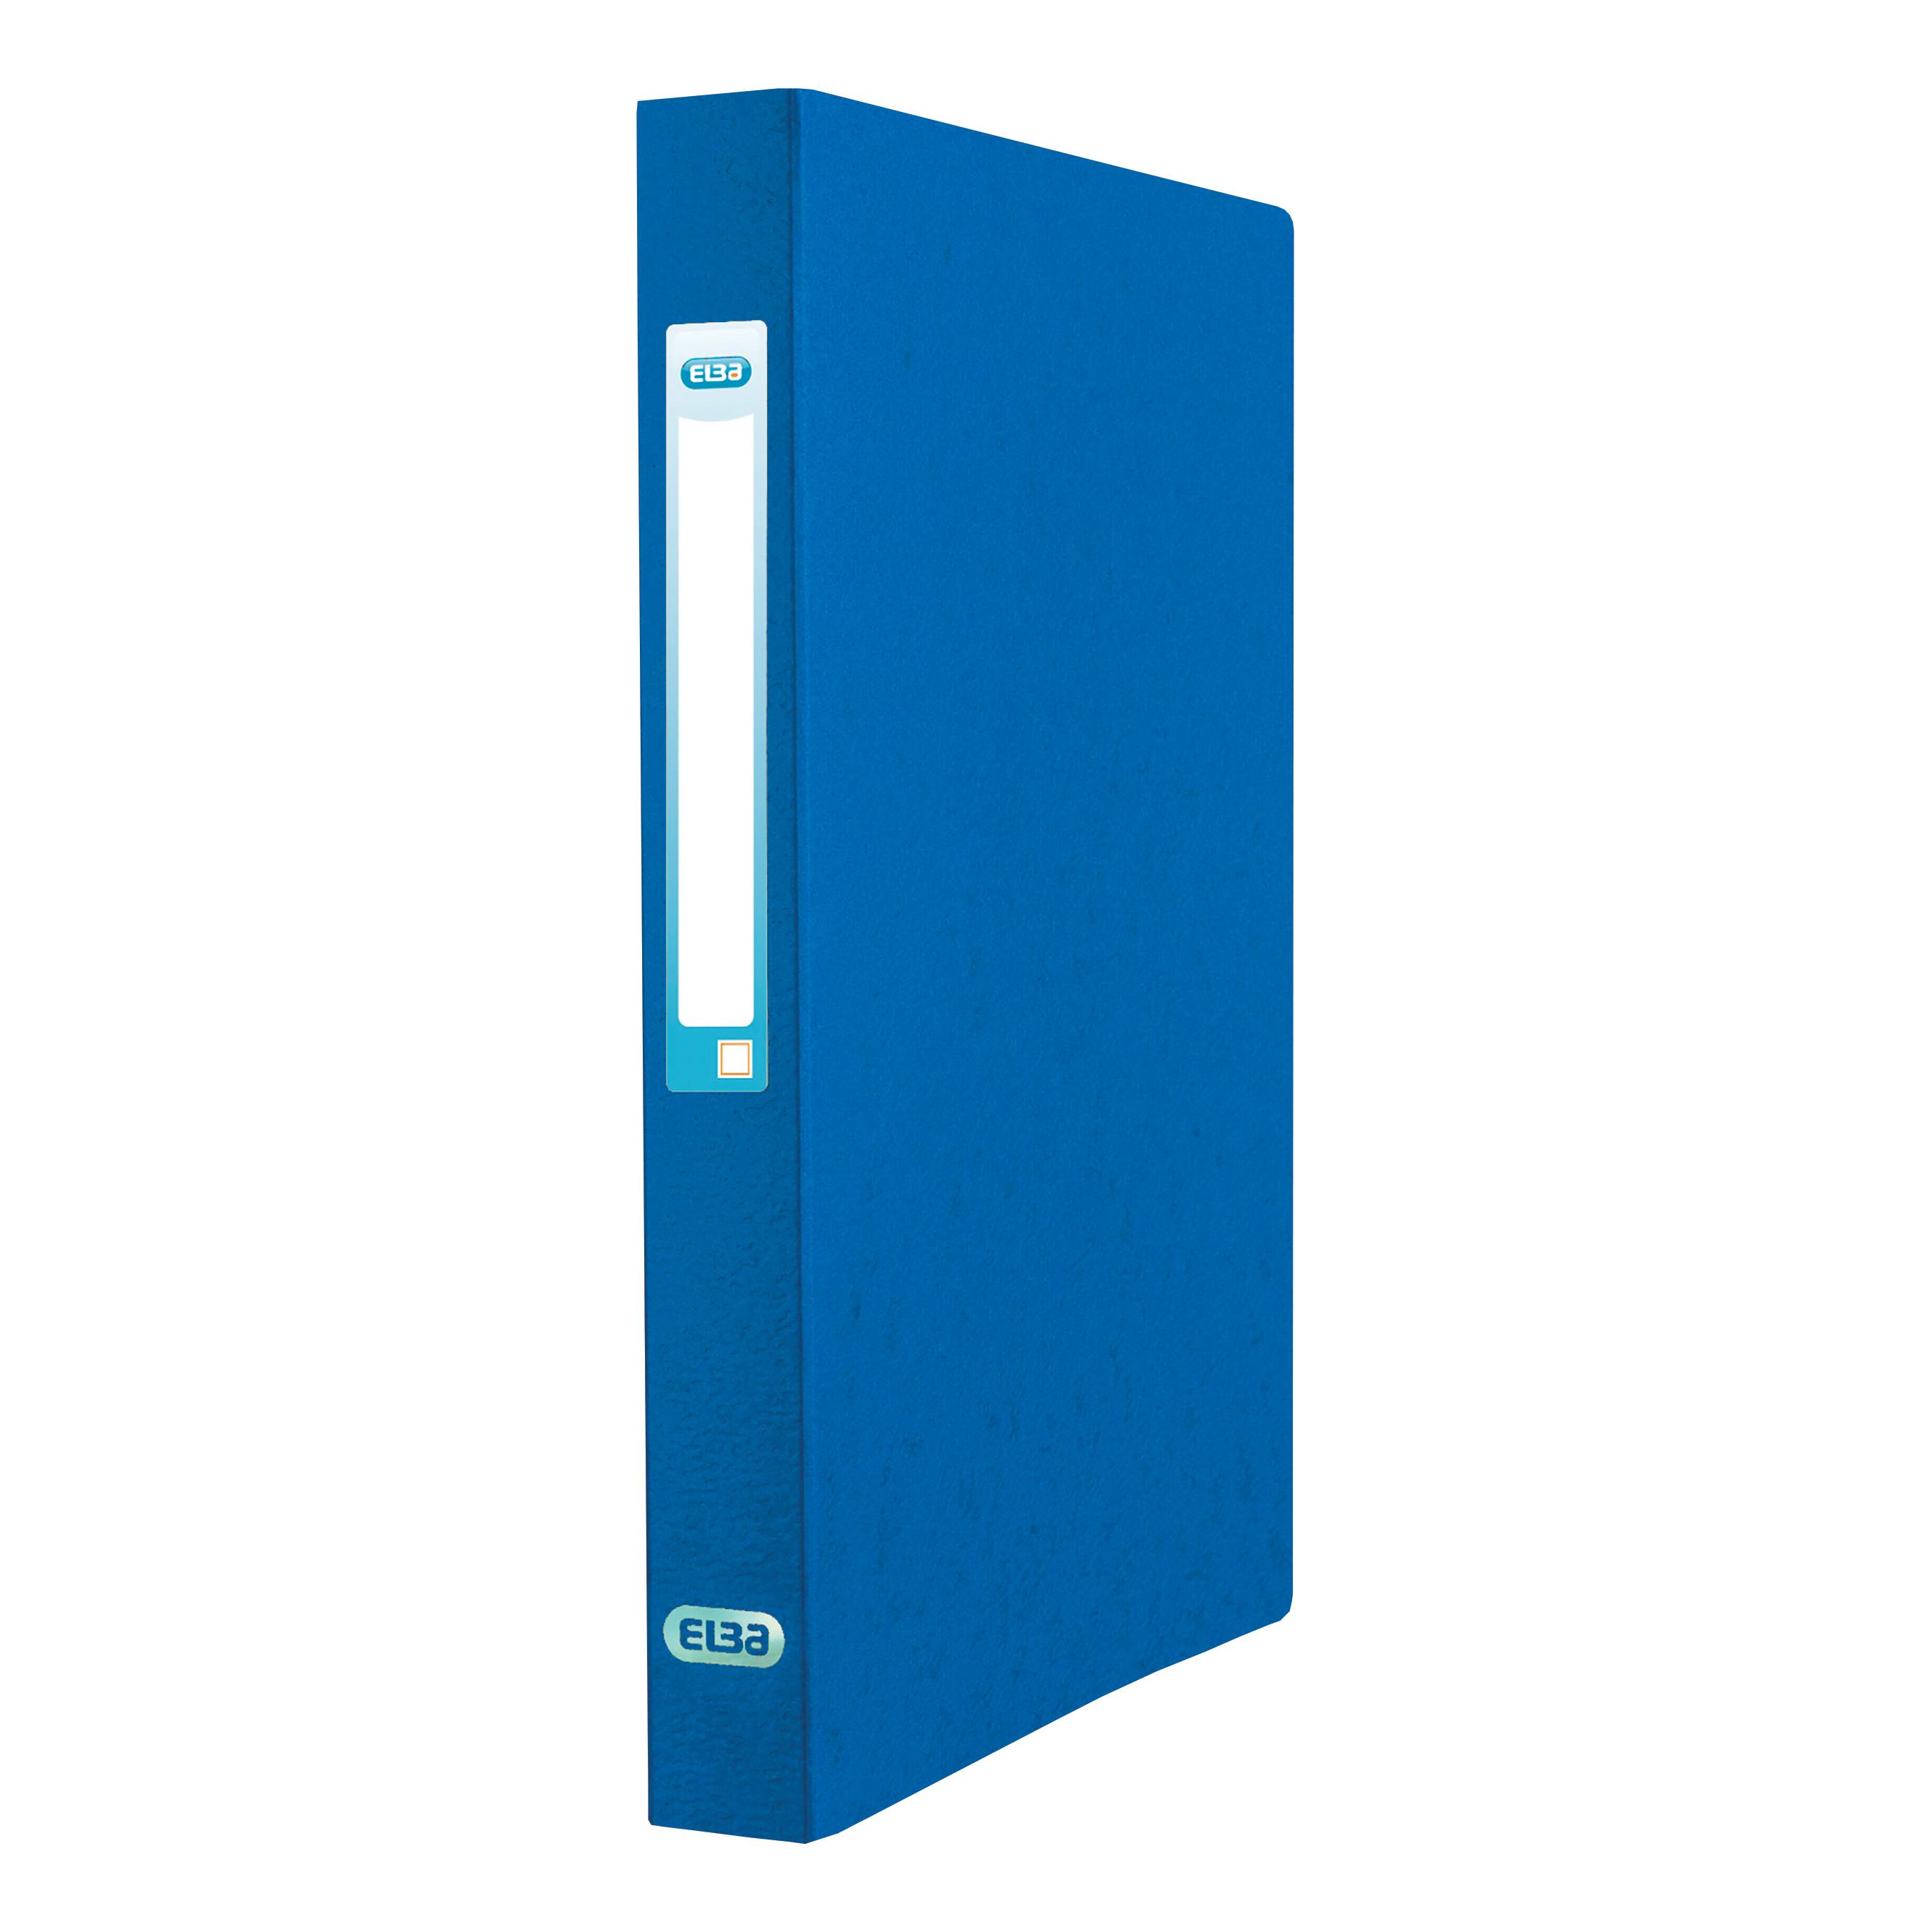 Elba Eurofolio Ring Binder Pressboard 2 O-Ring Size 25mm A4 Blue Ref 100201469 [Pack 10]